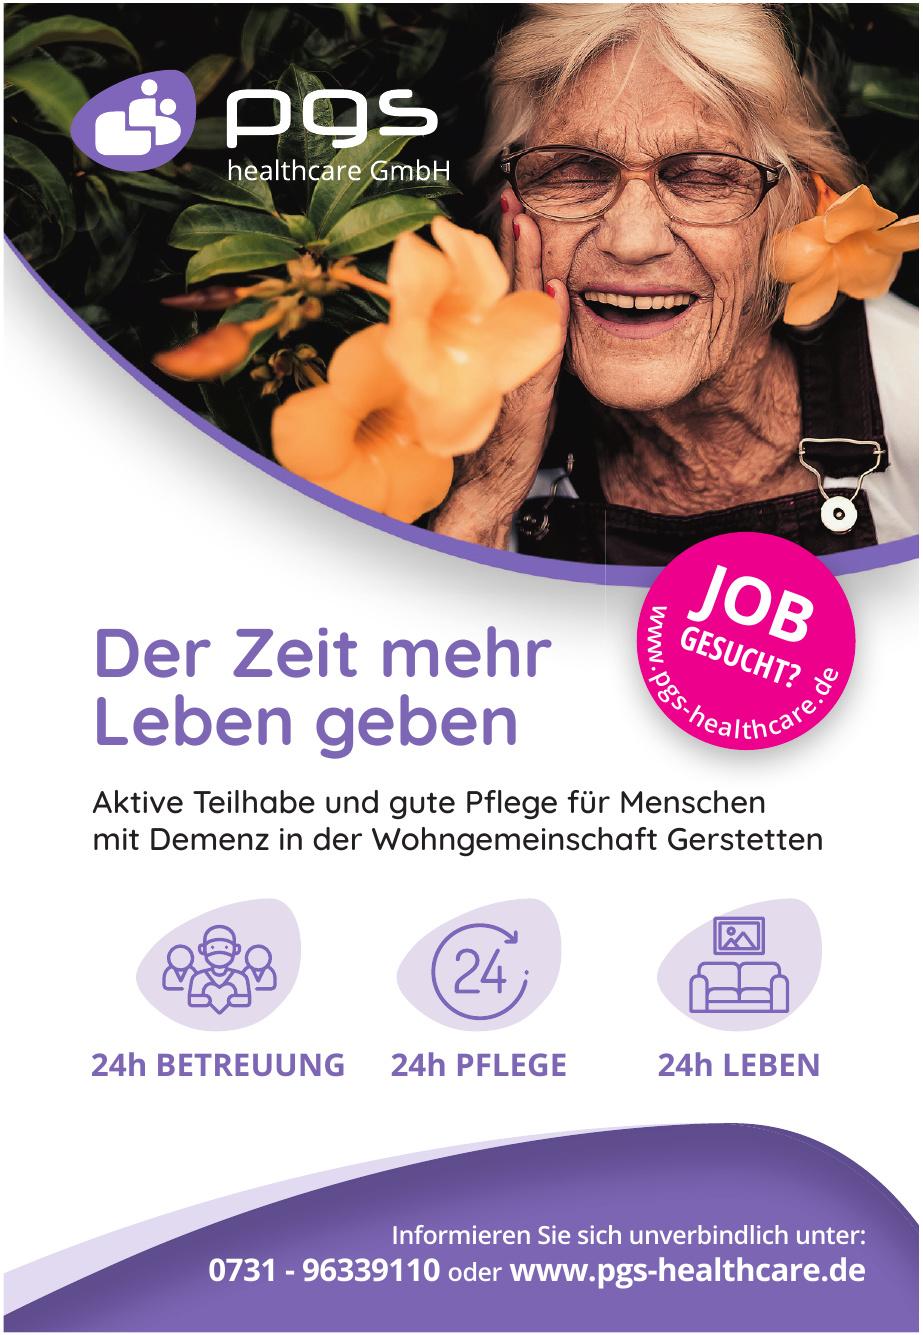 PGS healthcare GmbH